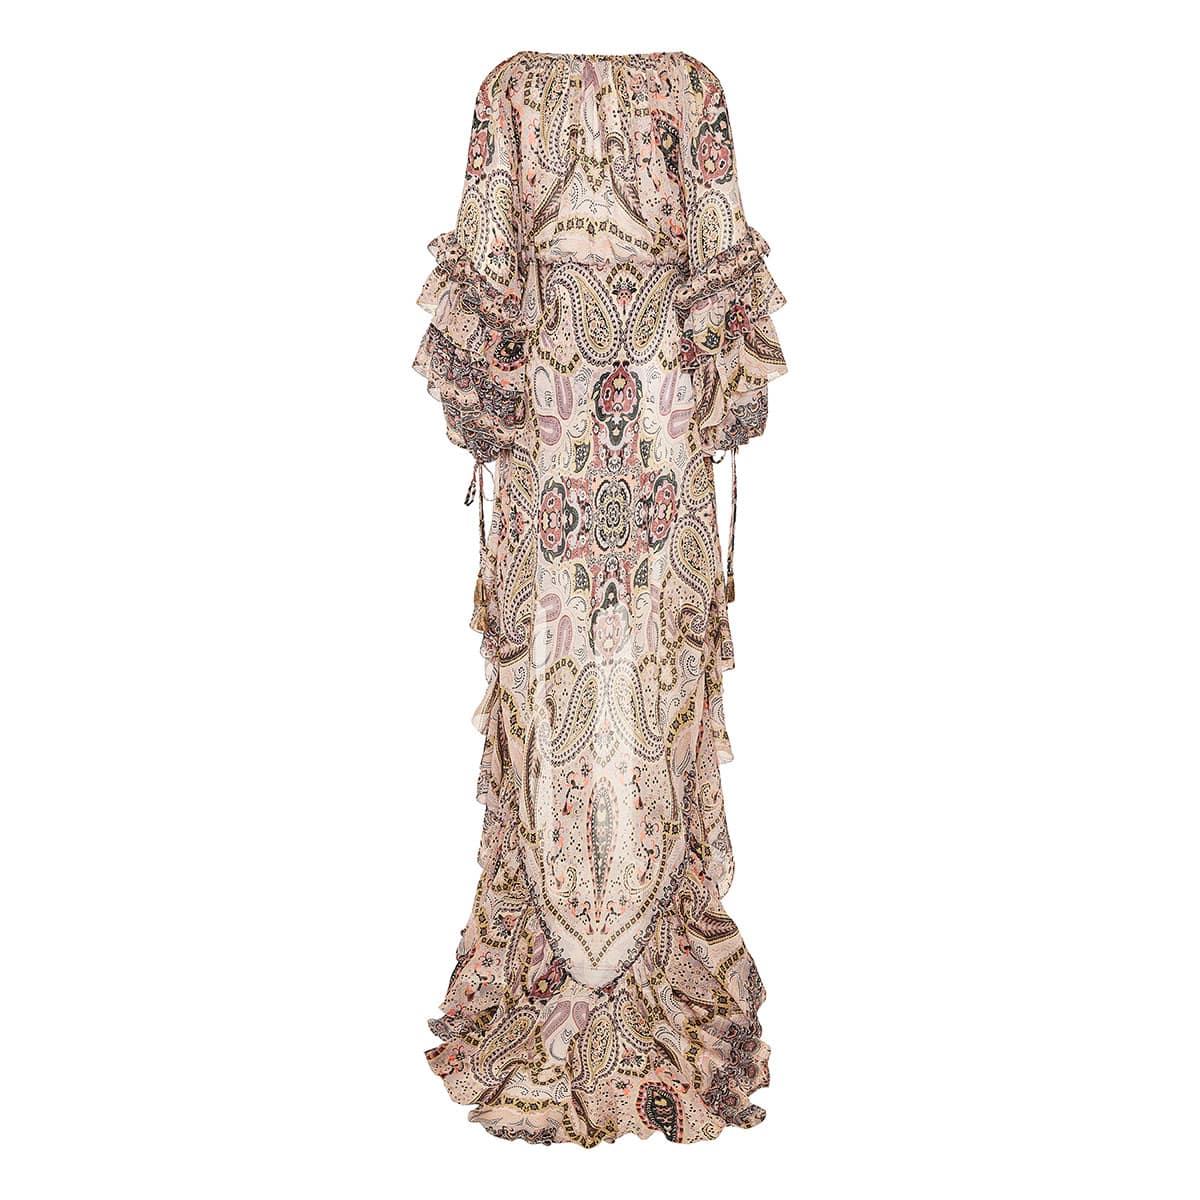 Ruffle-trimmed paisley chiffon gown